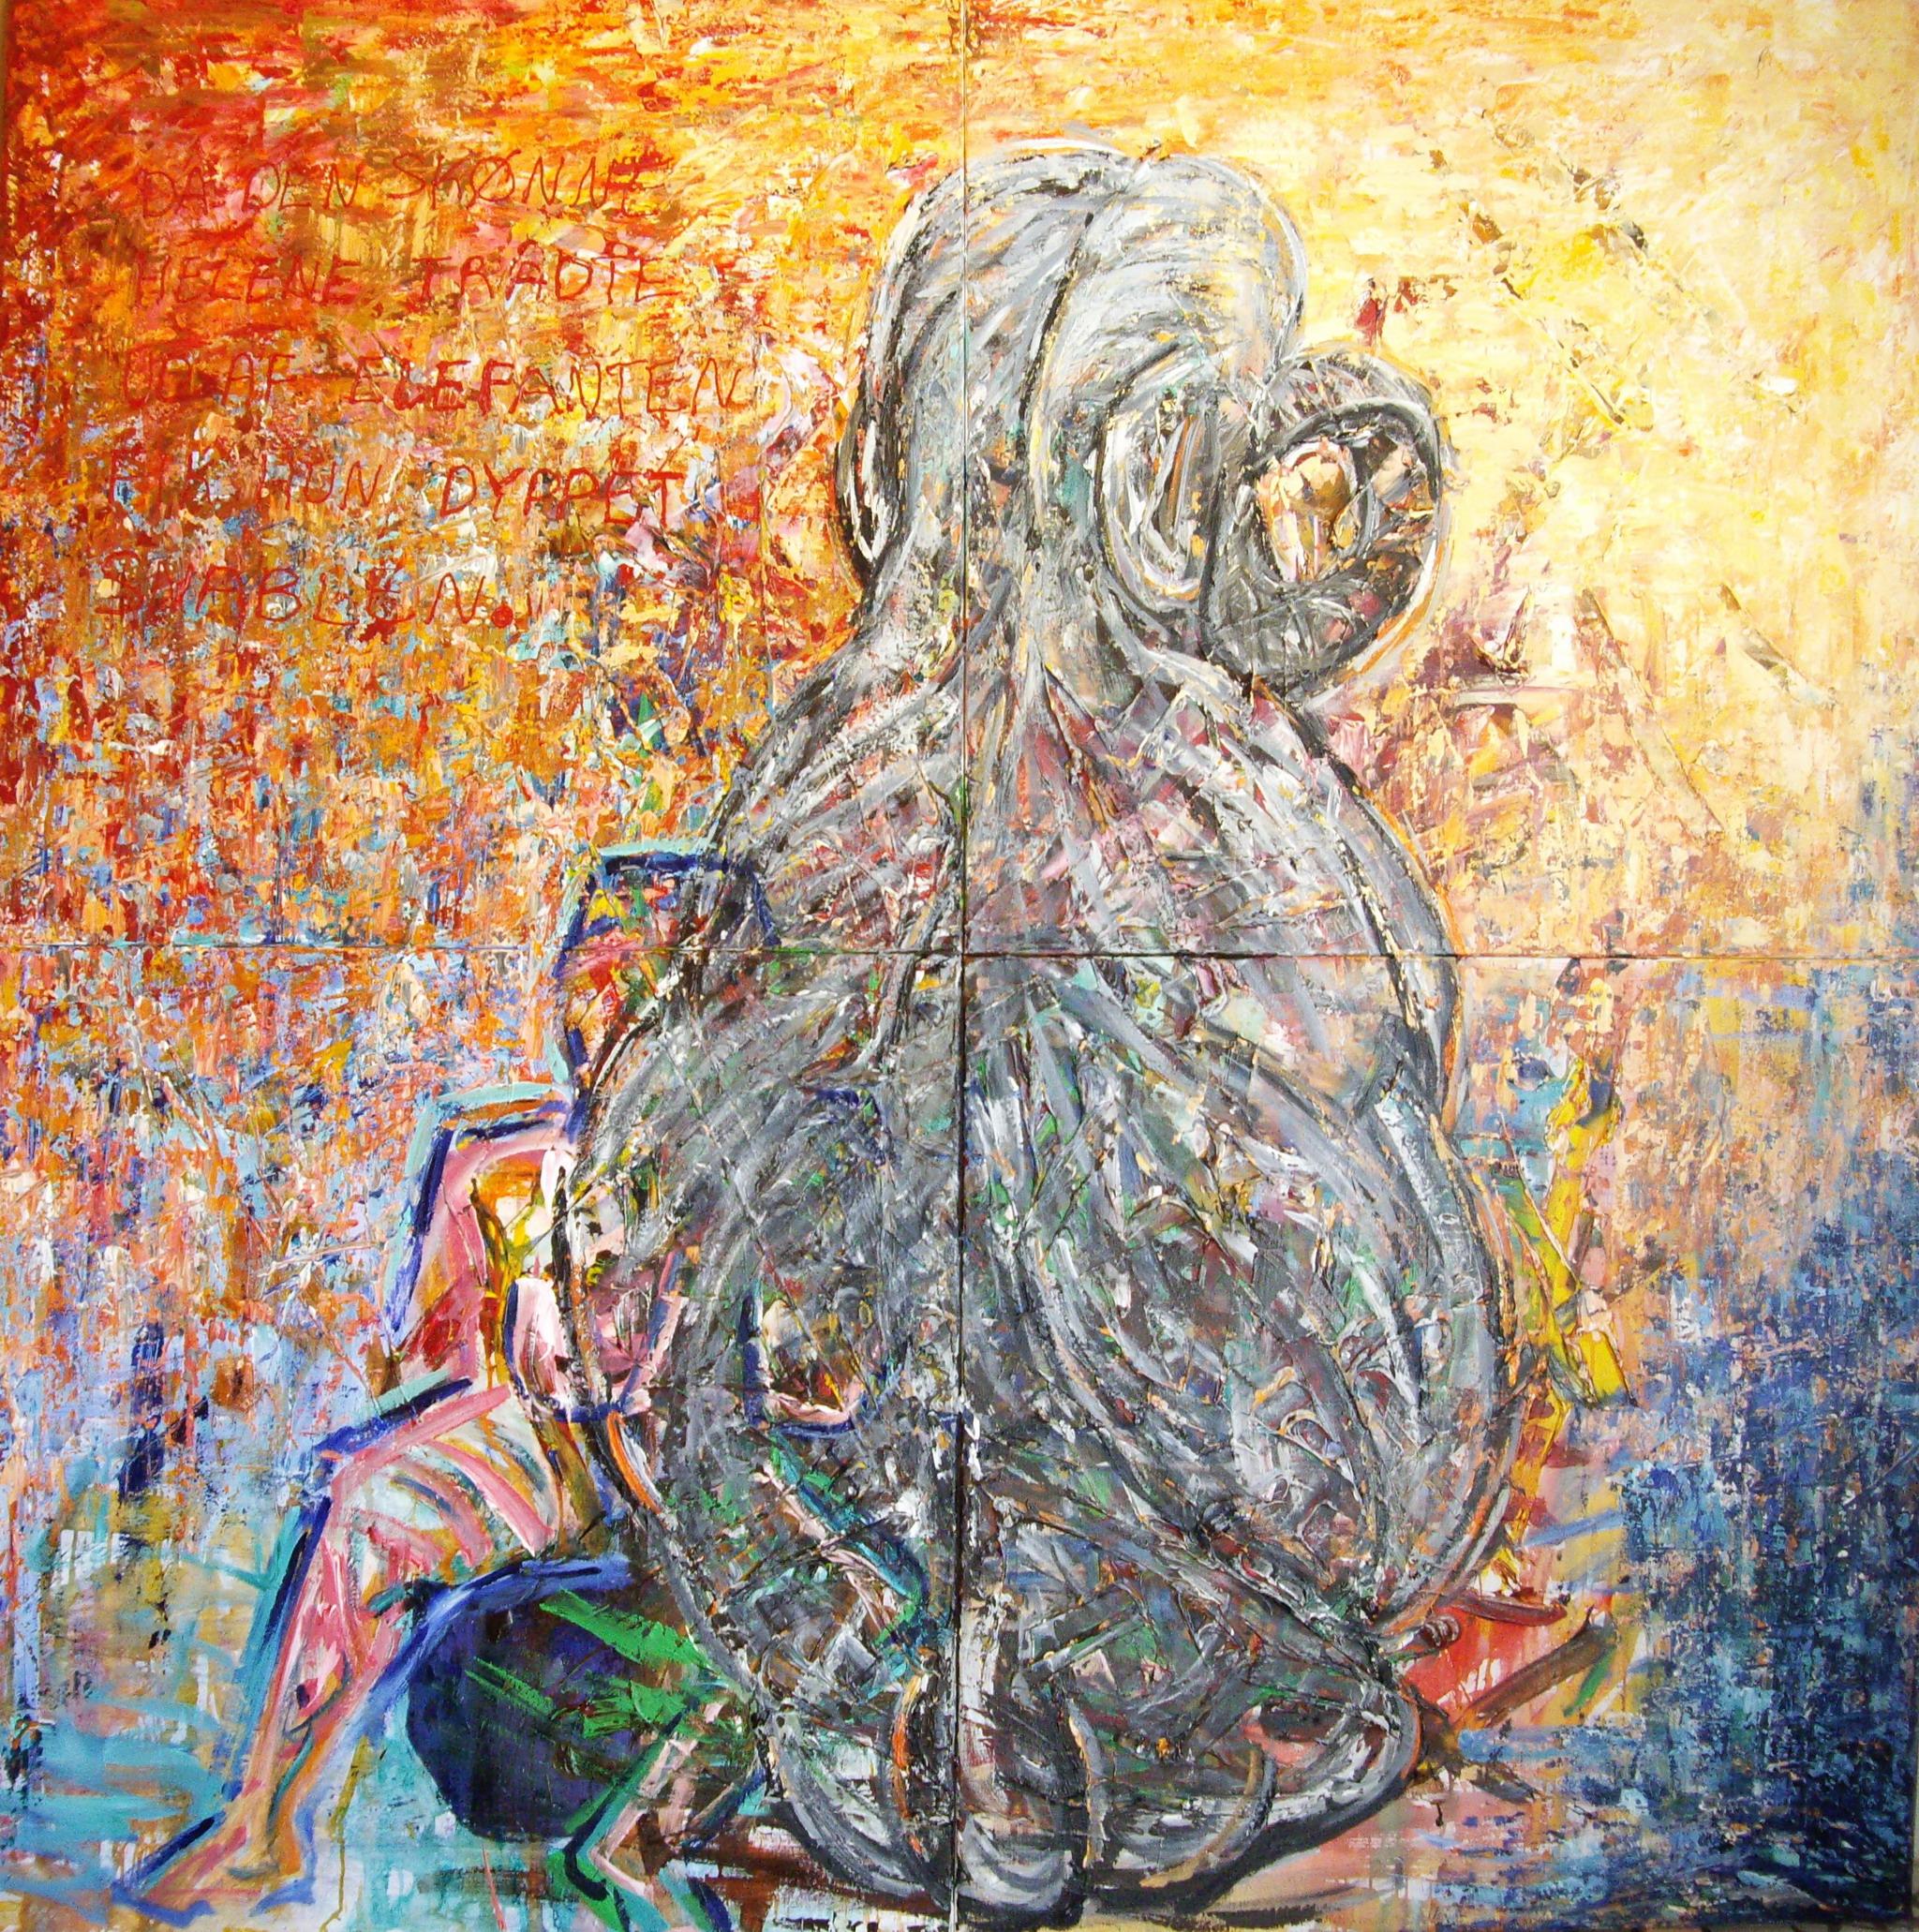 Elefanten maleri - Elephant painting